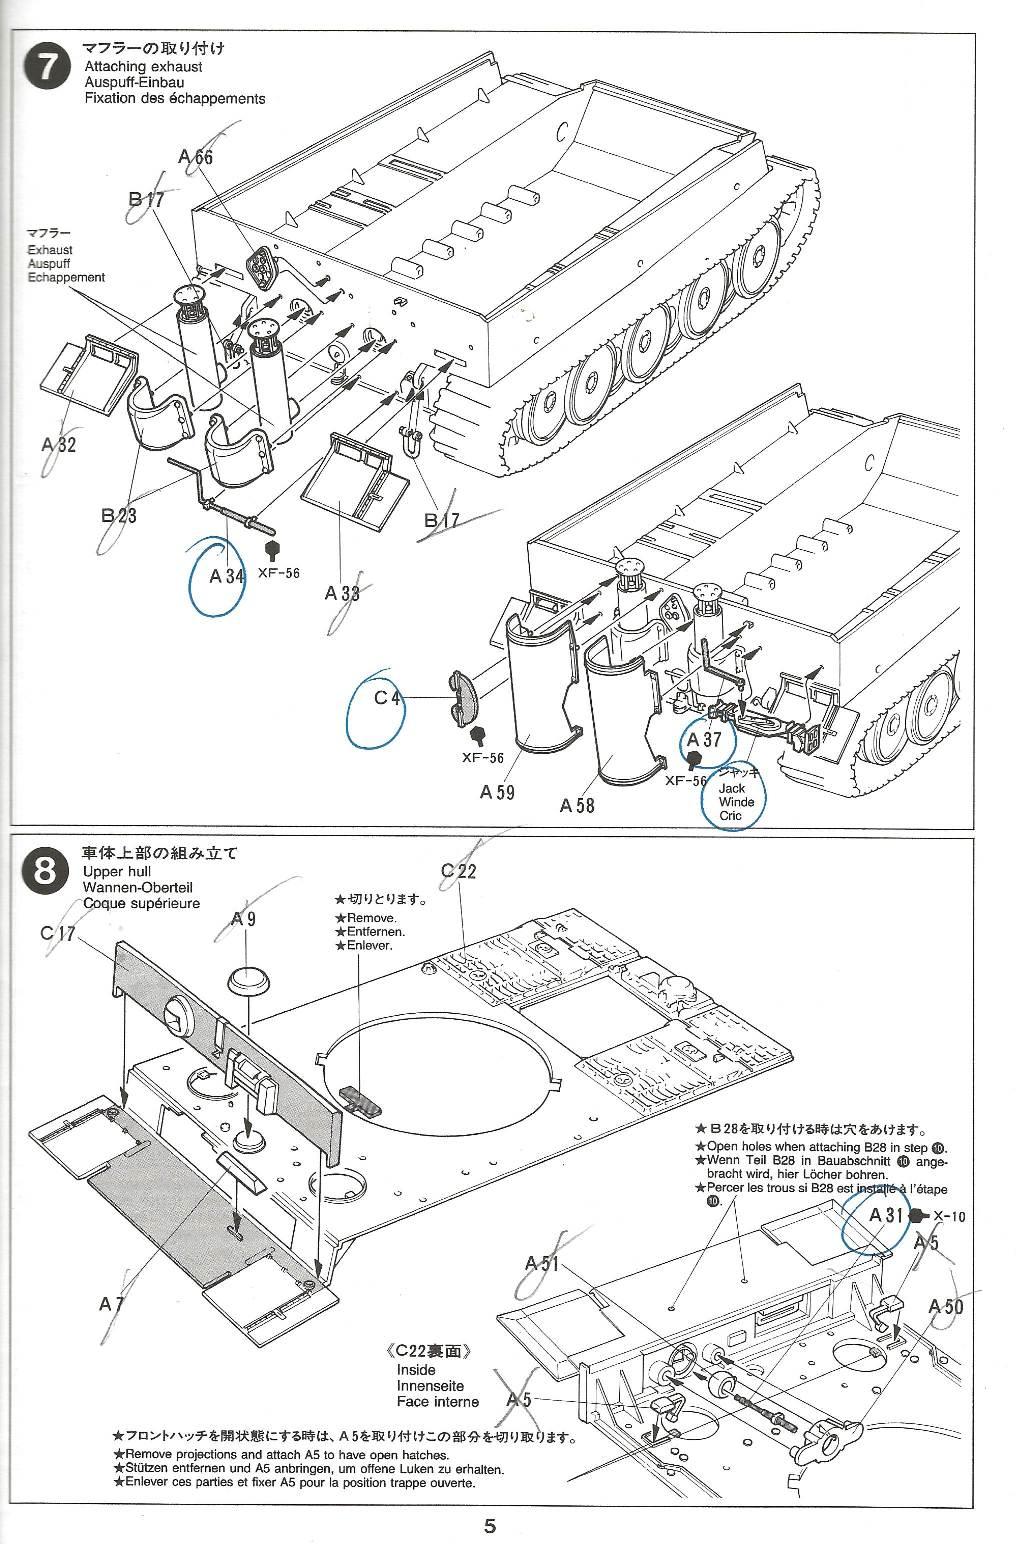 [Tamiya 1/35]  Tiger I mid production réf. 35194 Tigremid-plan-5